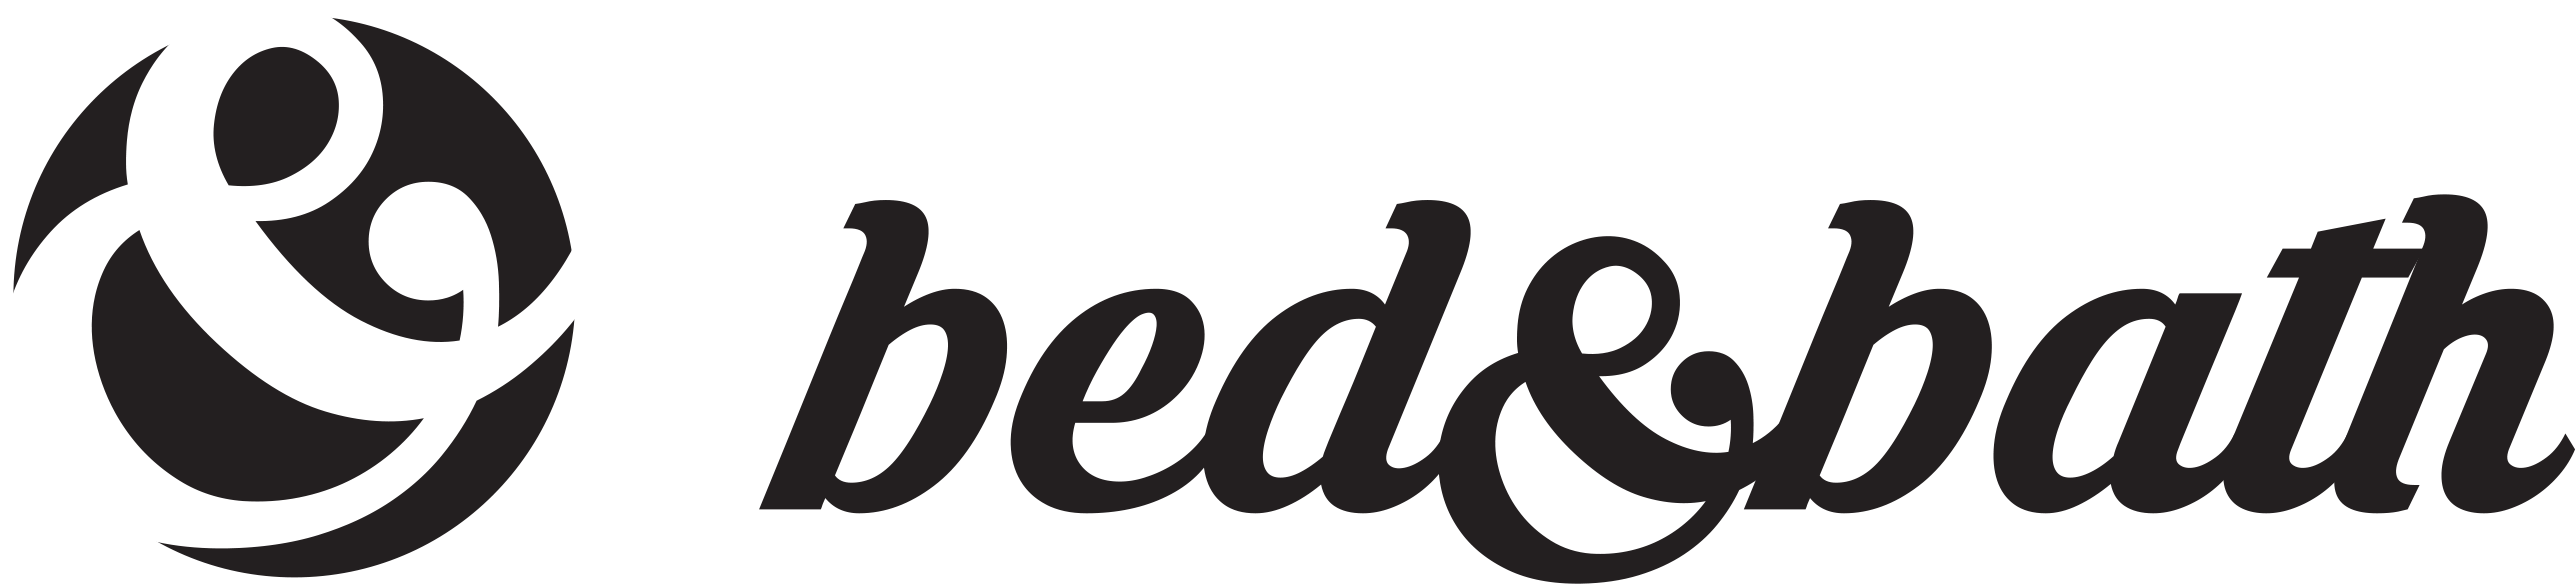 logo-wybrane